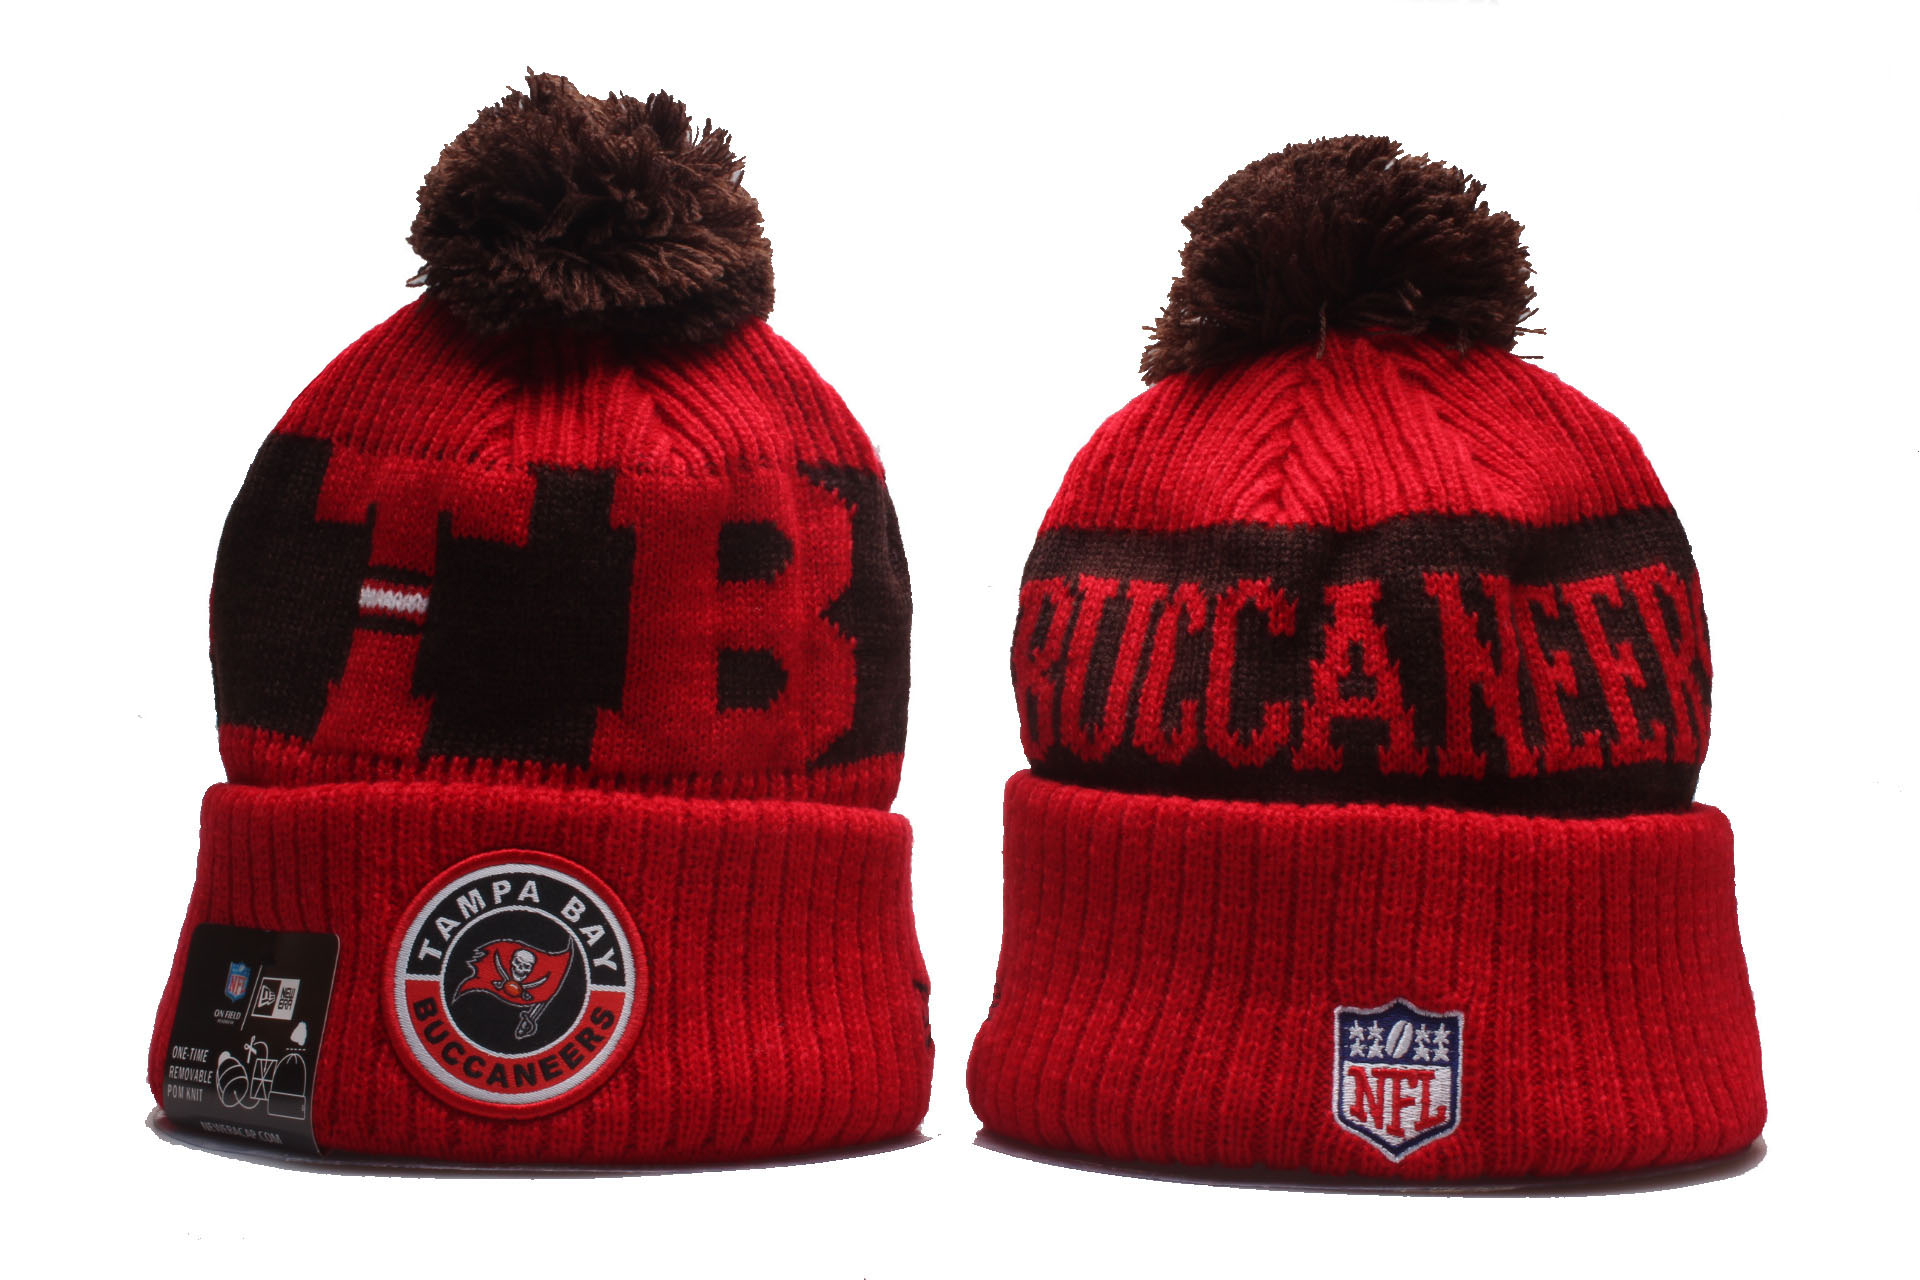 Buccaneers Team Logo Red 2020 NFL Sideline Pom Cuffed Knit Hat YP